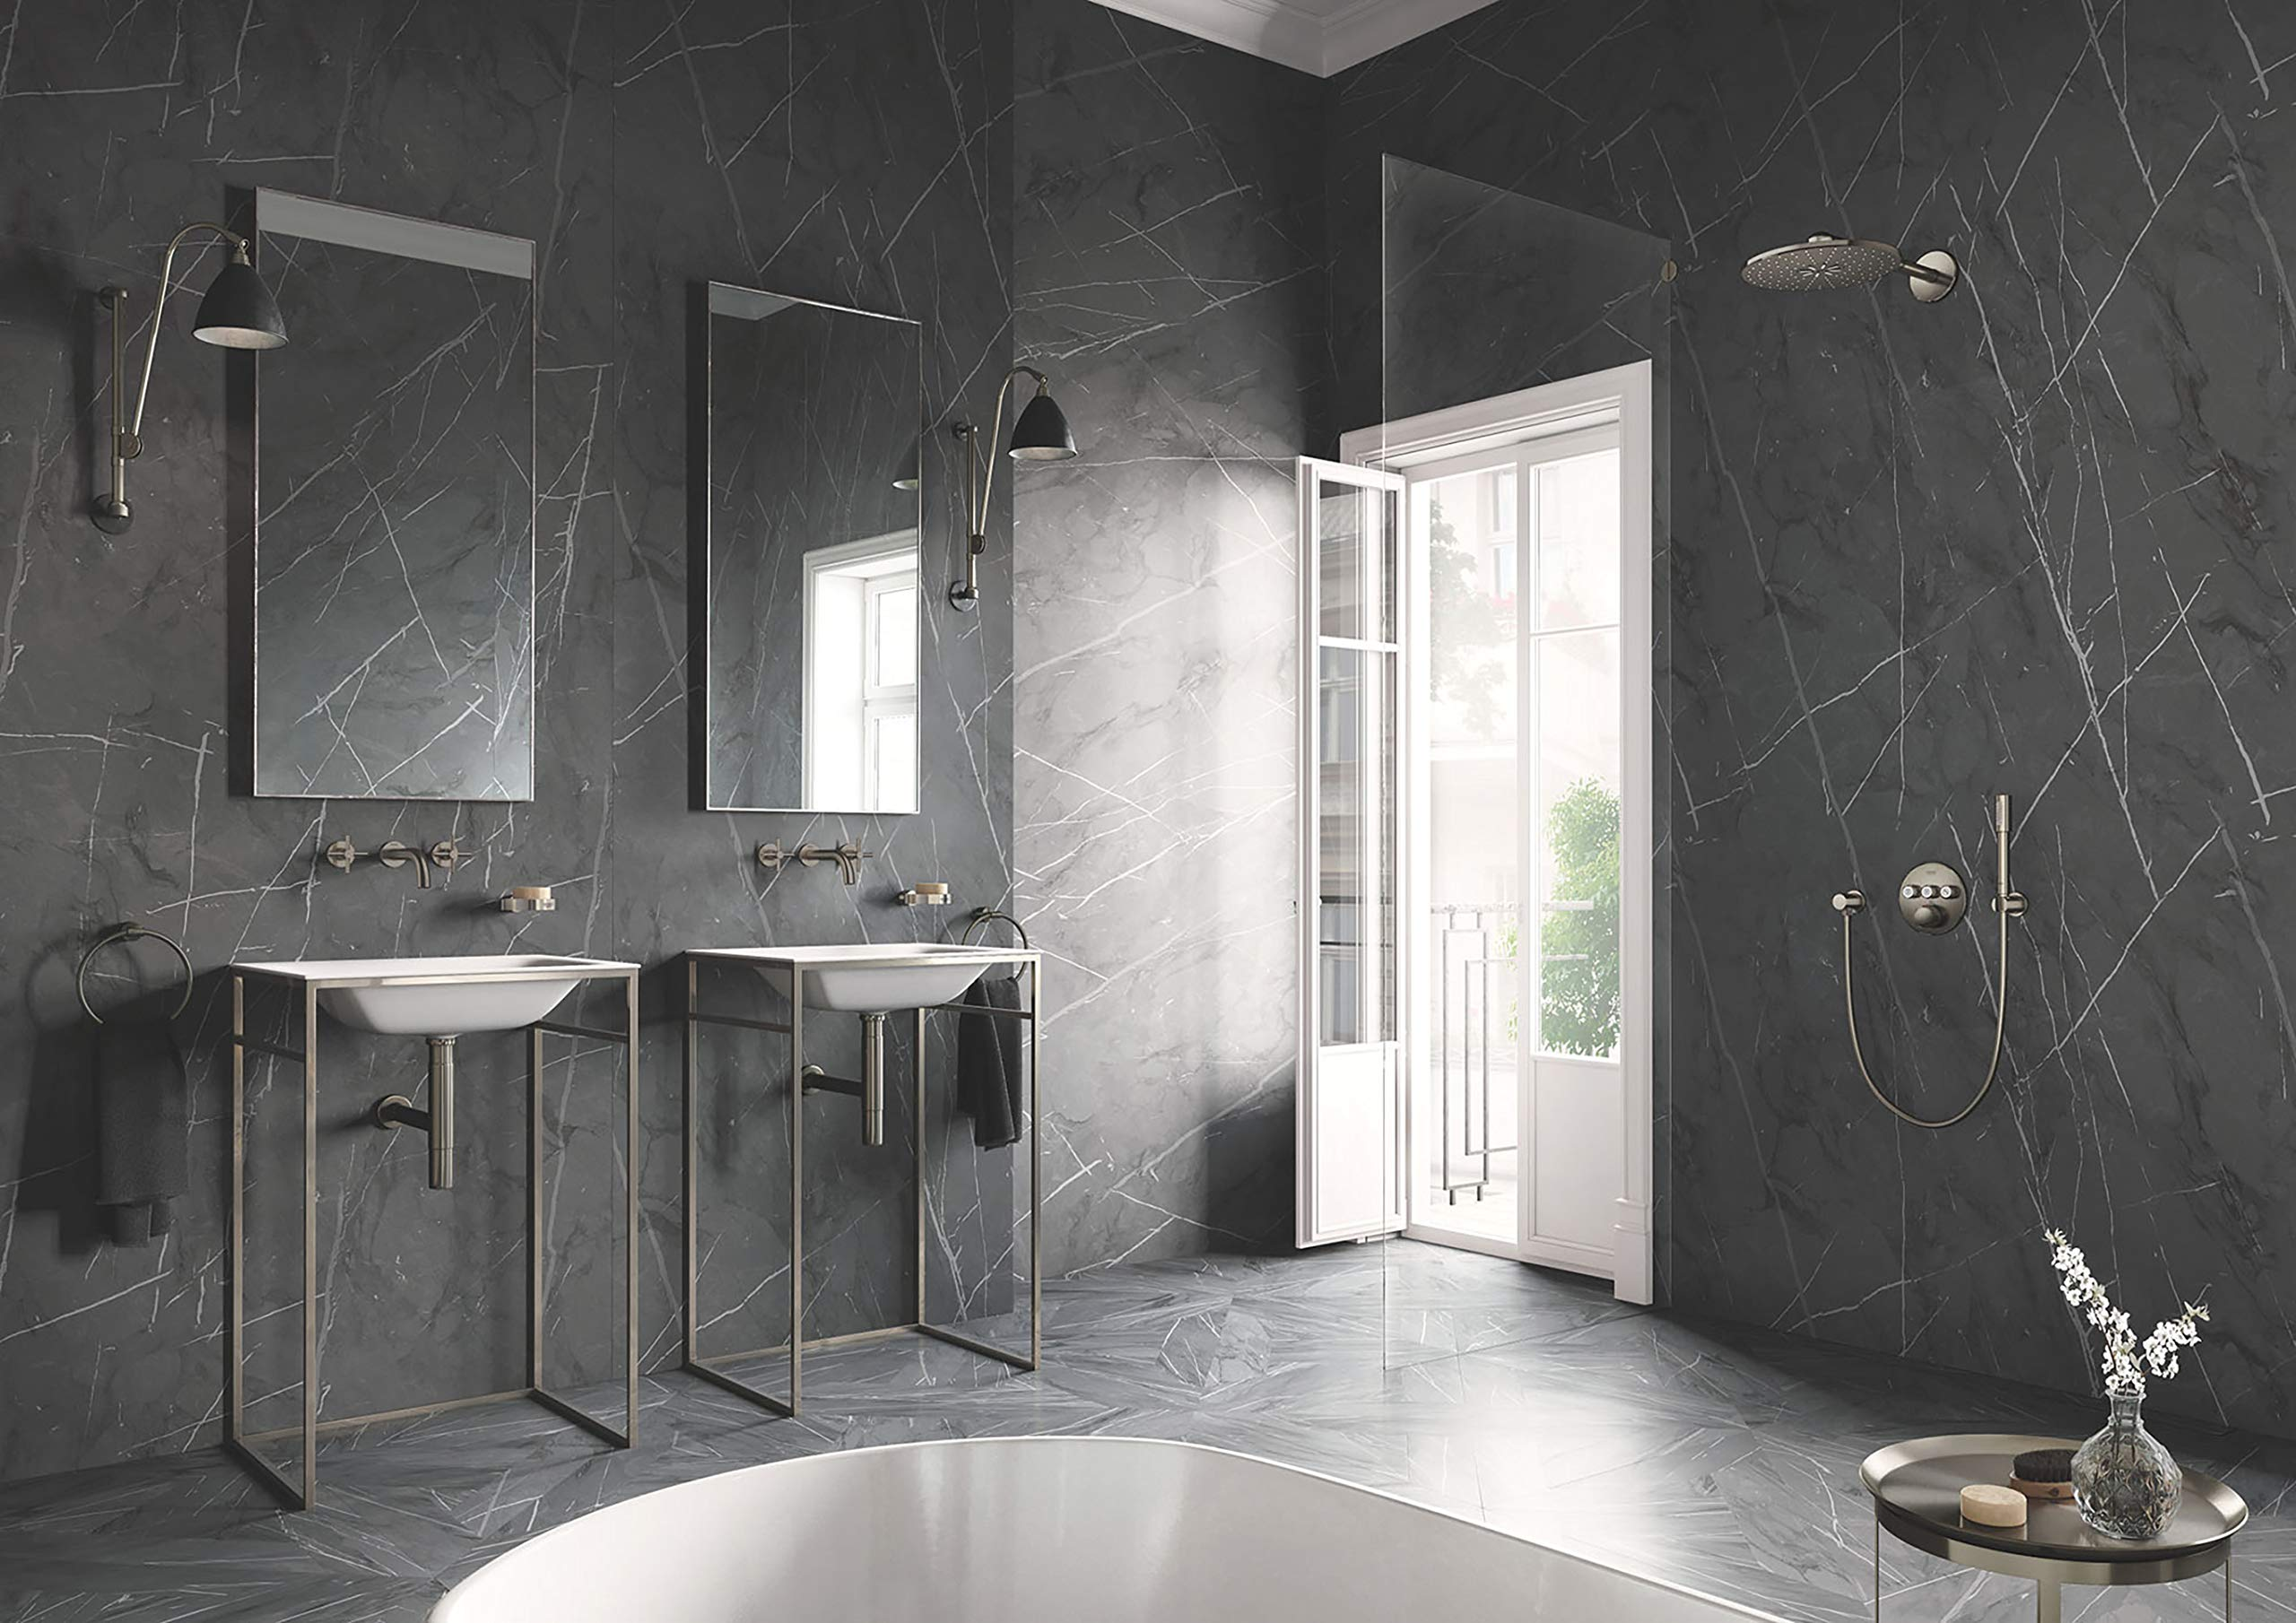 Grohe 18026EN3 Atrio Bathroom Faucet Cross Handles, Brushed Nickel by GROHE (Image #8)